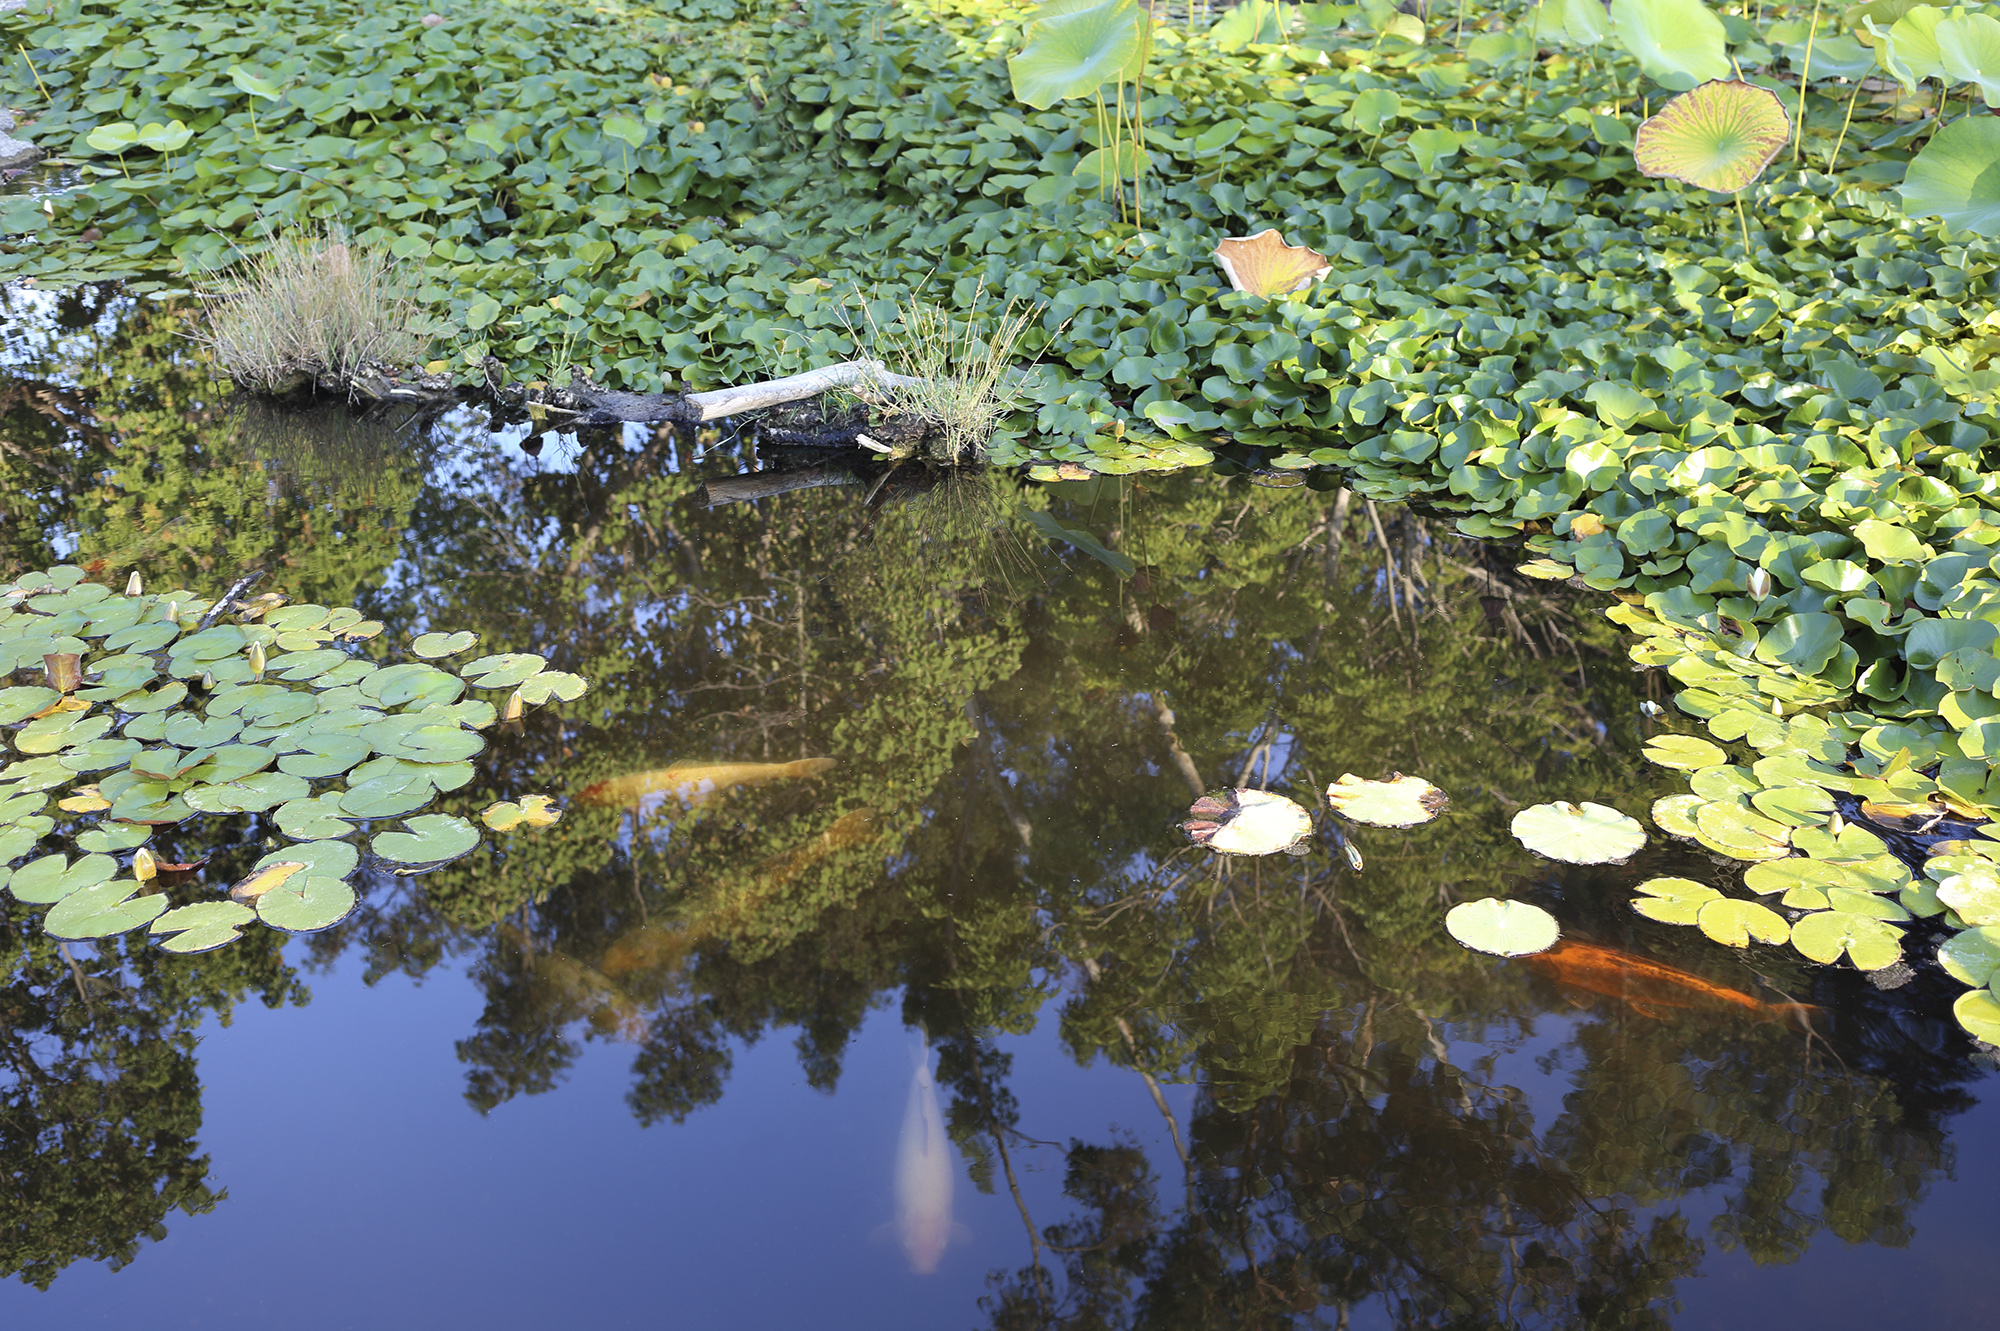 Peacful Pond by Rich J. Velasco